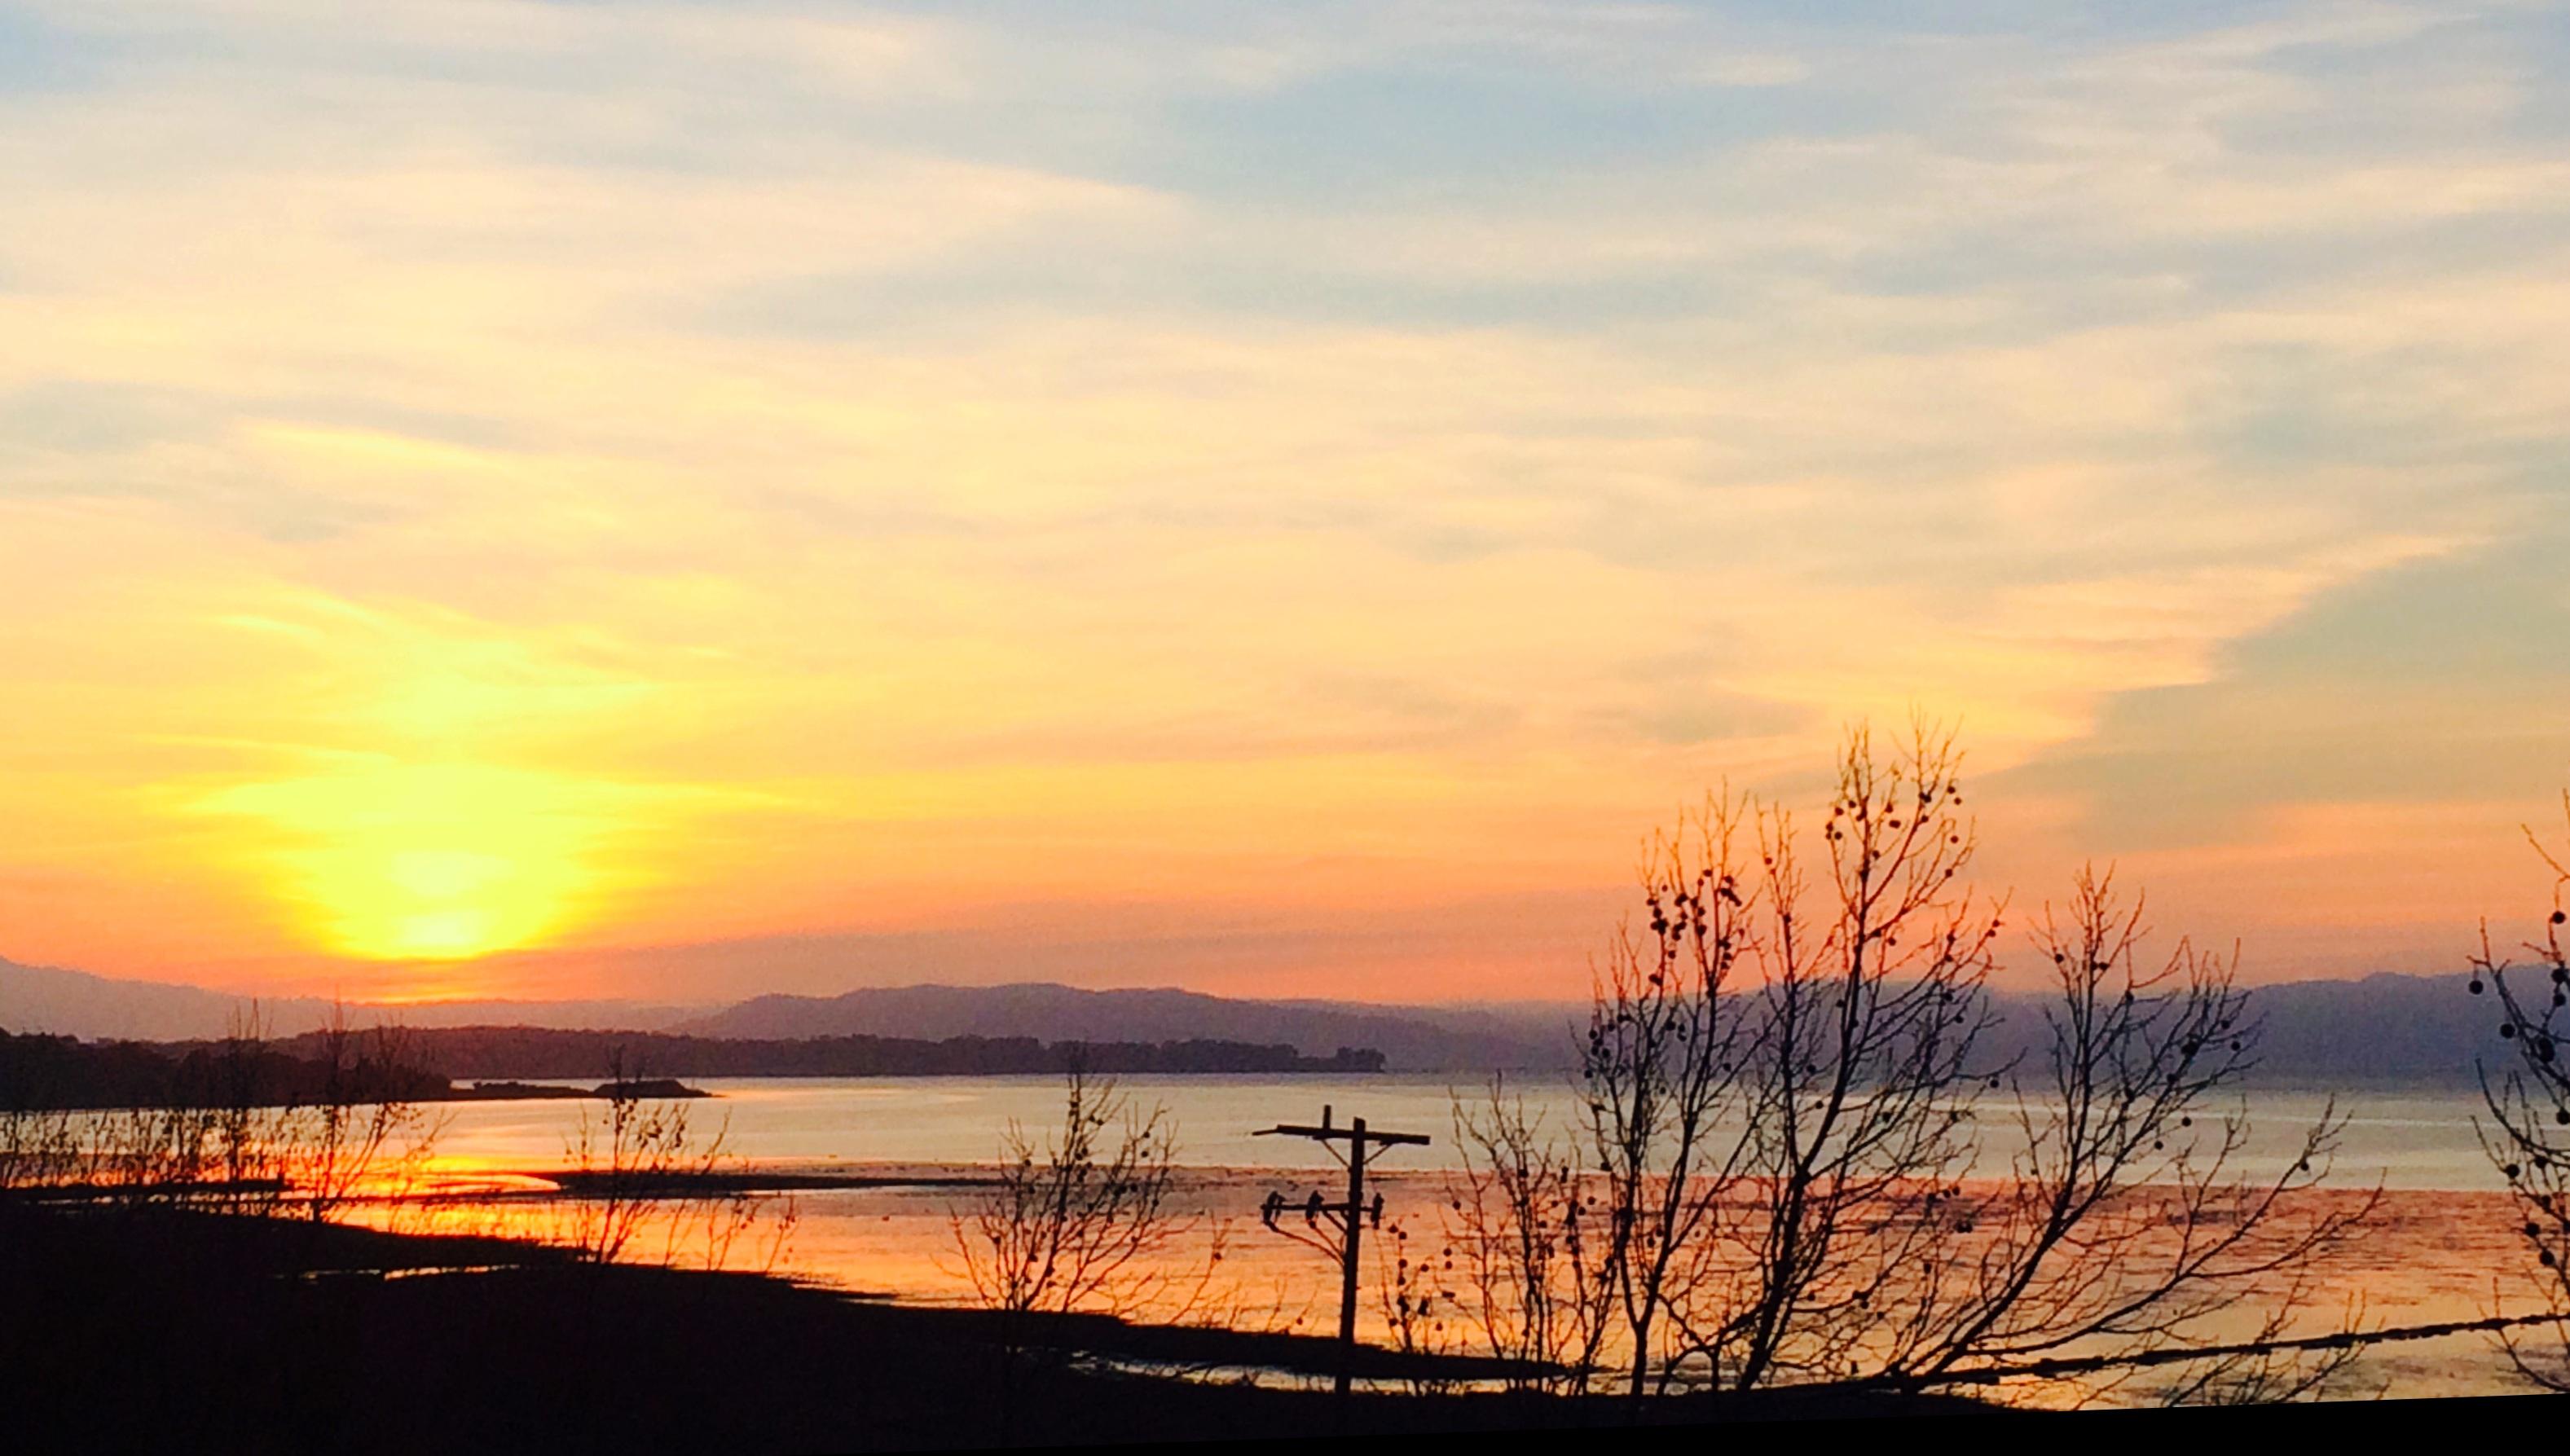 sunset @ Leila